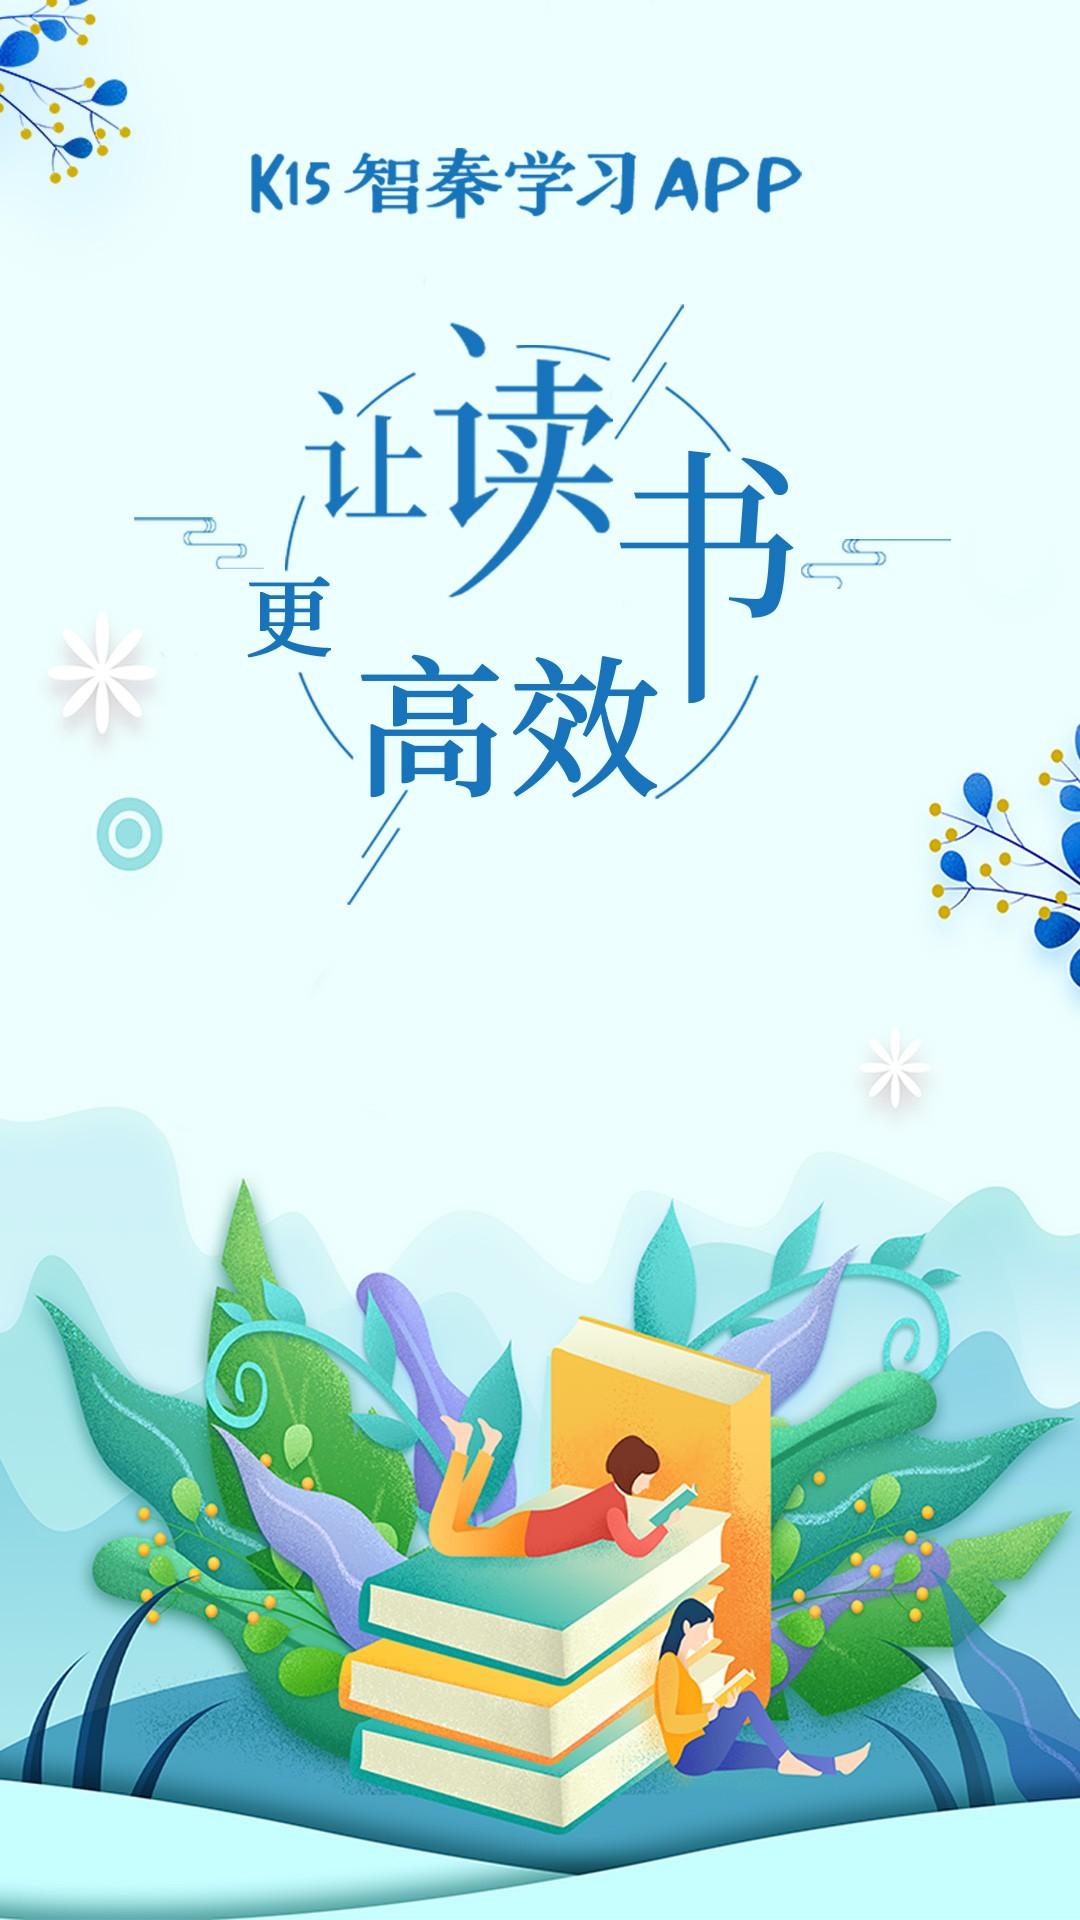 K15智秦学习app图1